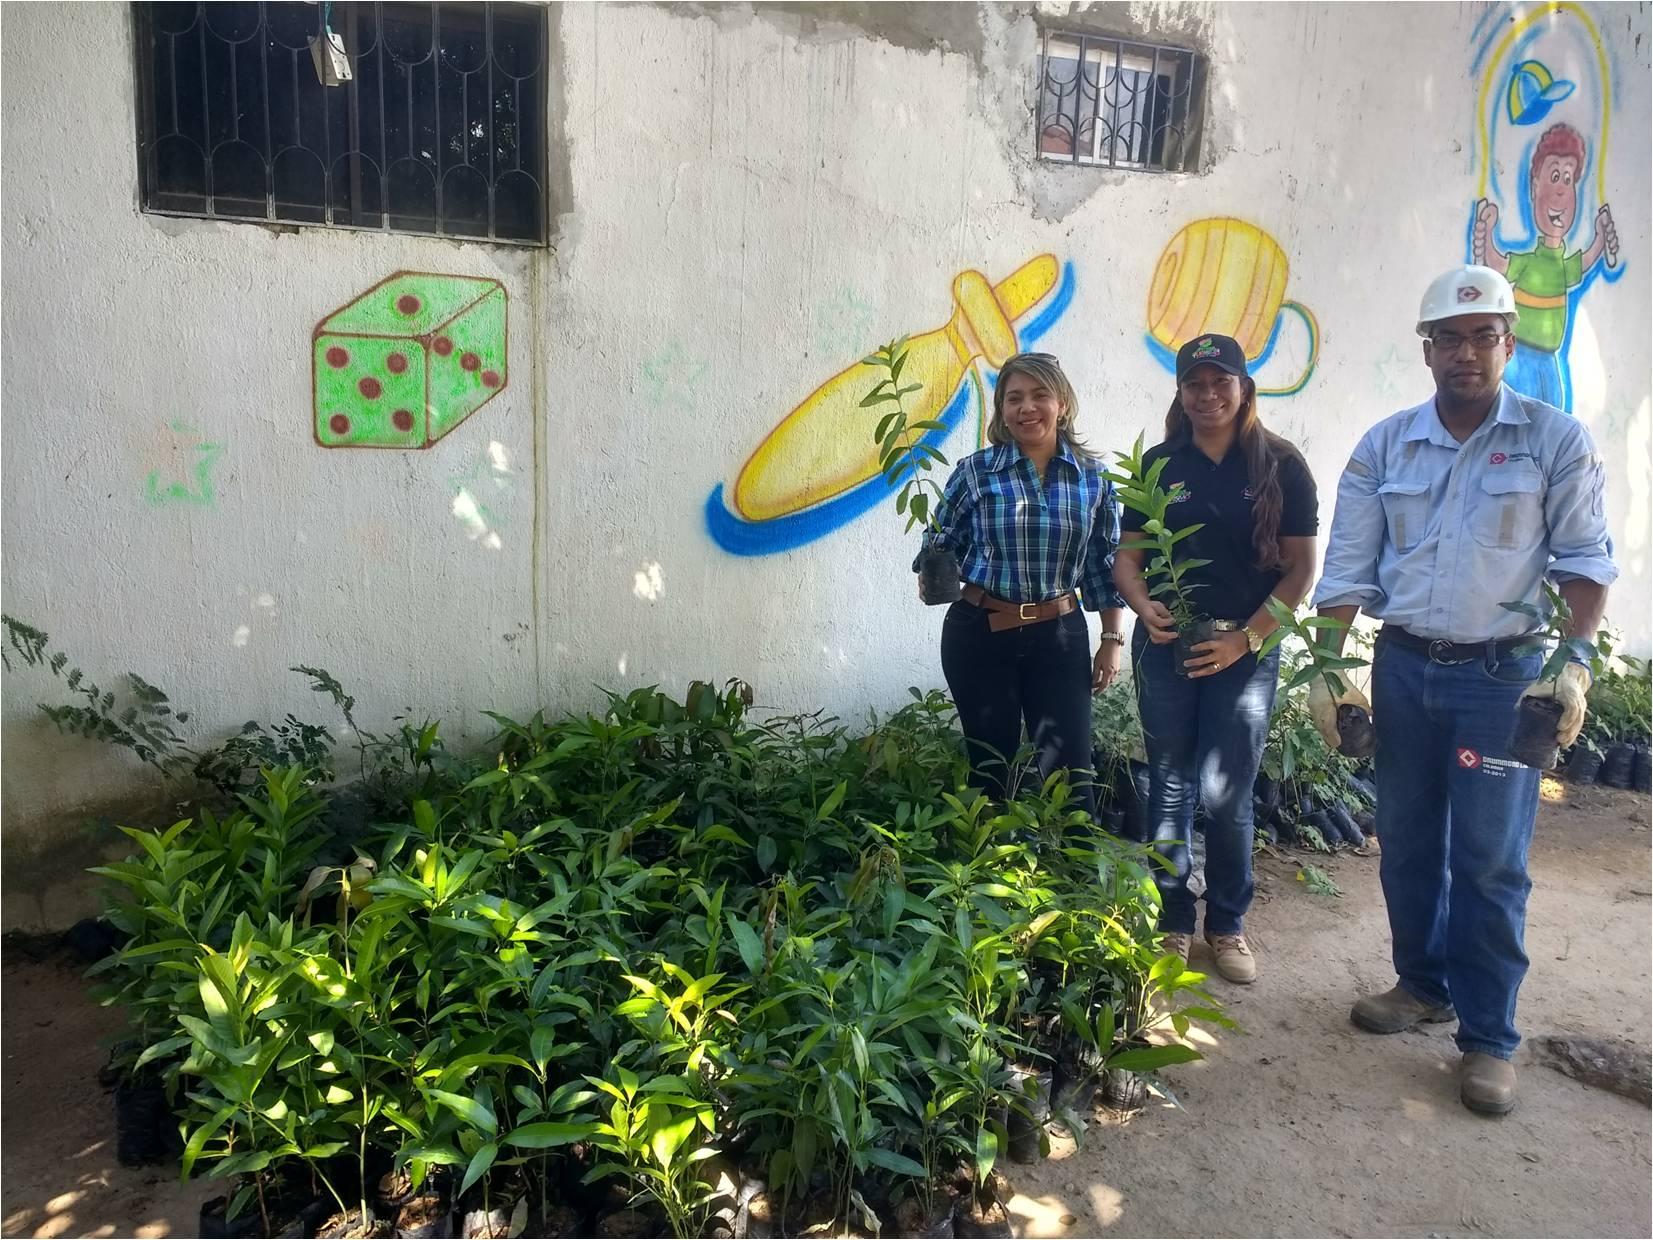 *Pictured: Yarceli Rangel, Mayor of La Jagua de Ibirico, Ranmisol Garcia, the secretary of the Environment, and Julio Hernandez, Drummond Ltd.'s environmental aid